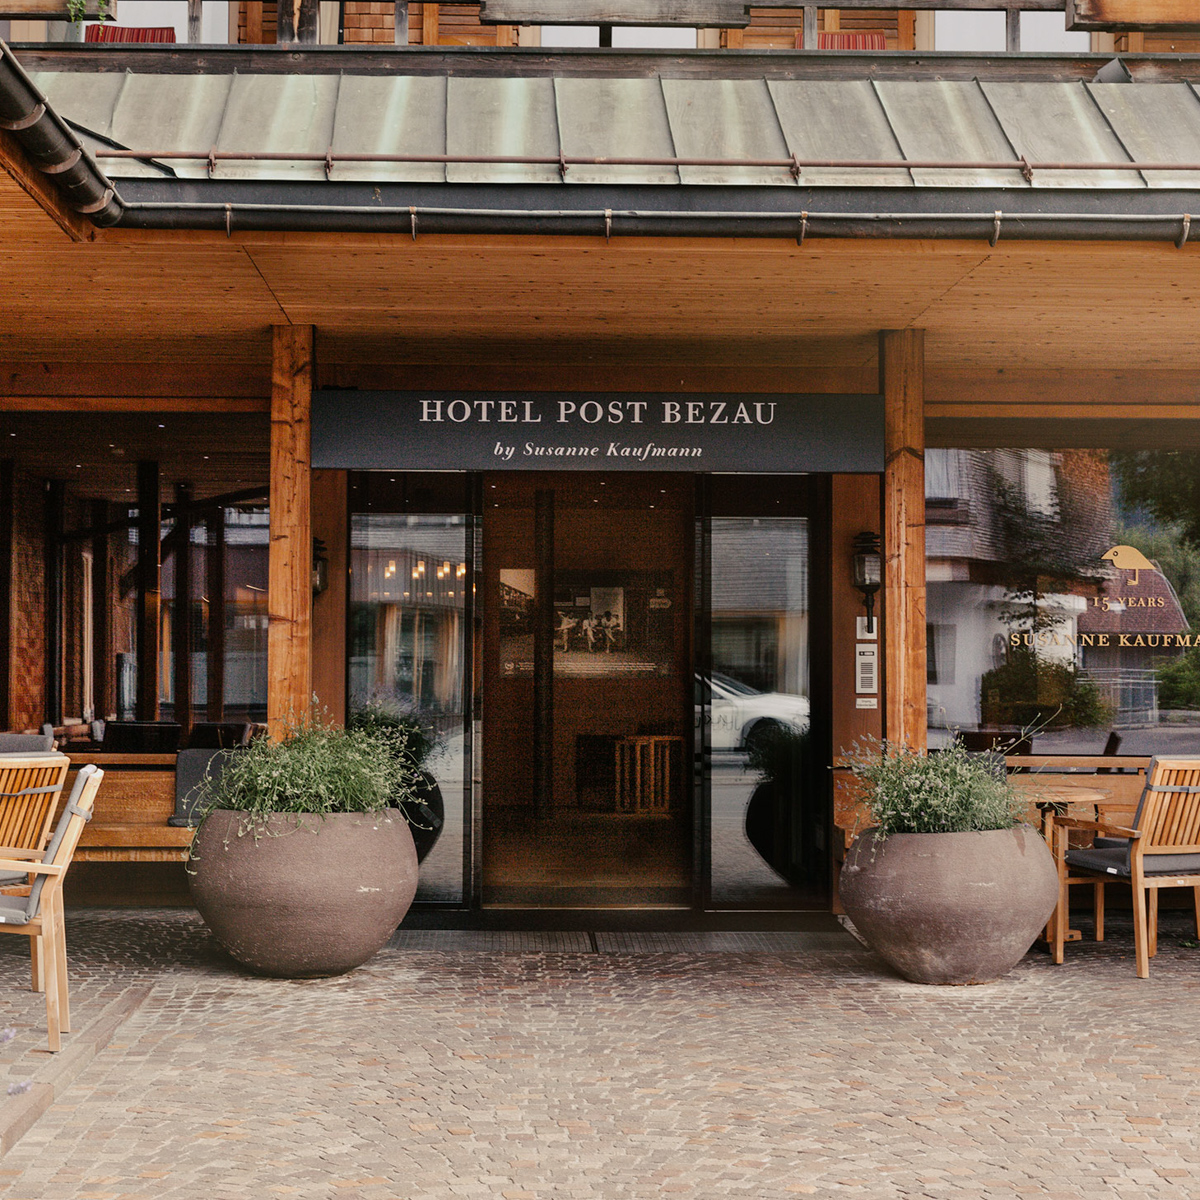 Hotel Post Bezau by Susanne Kaufmann-7